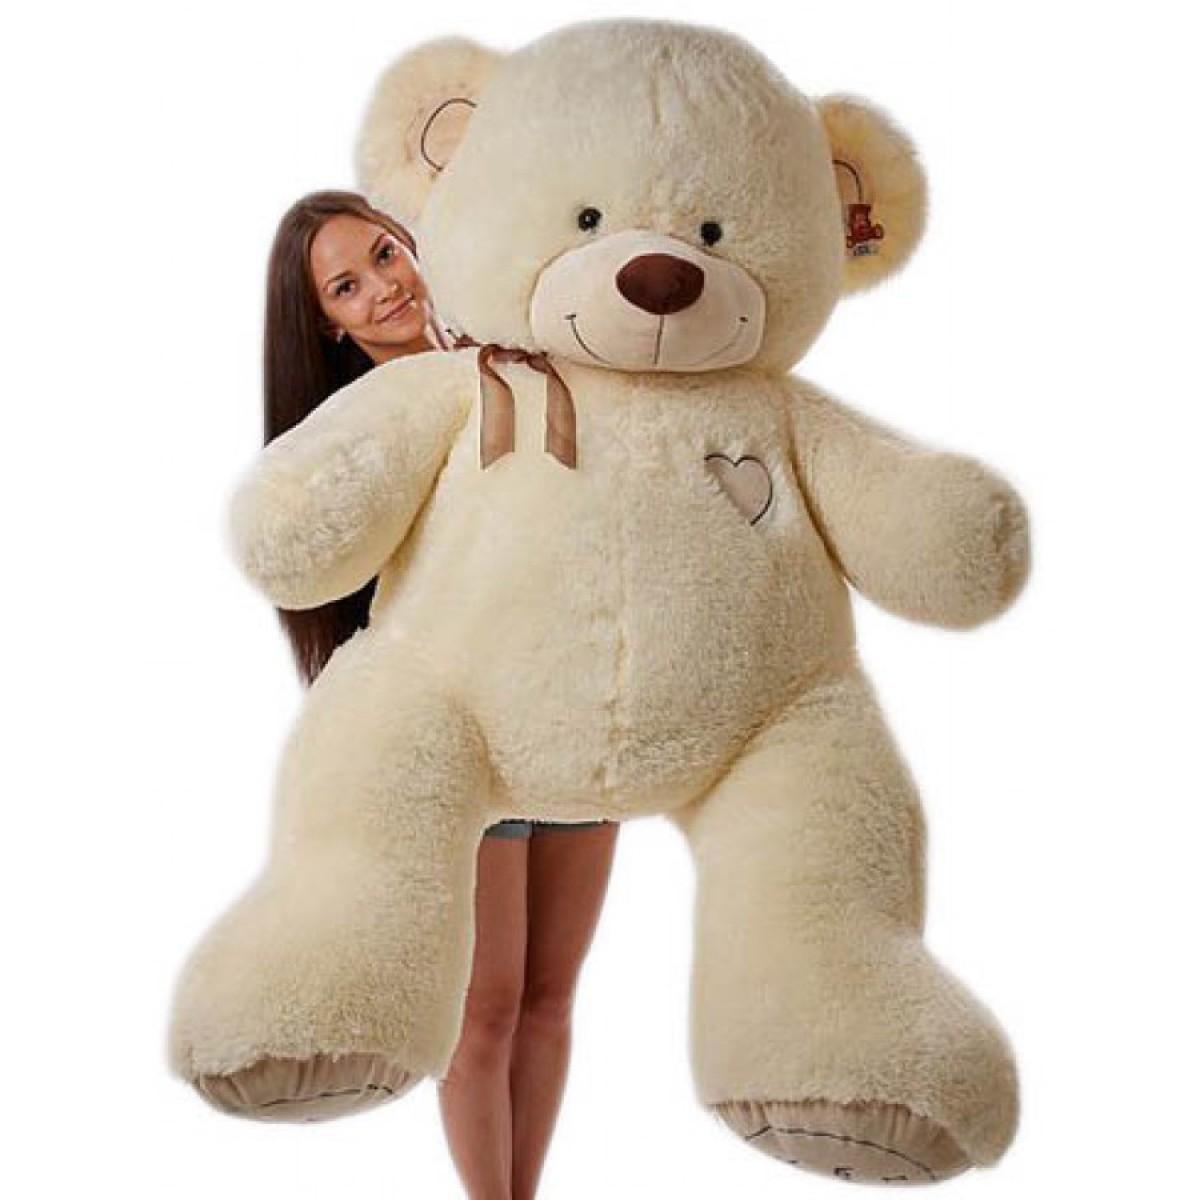 Уникална и огромна мечка 200 см - слонова кост